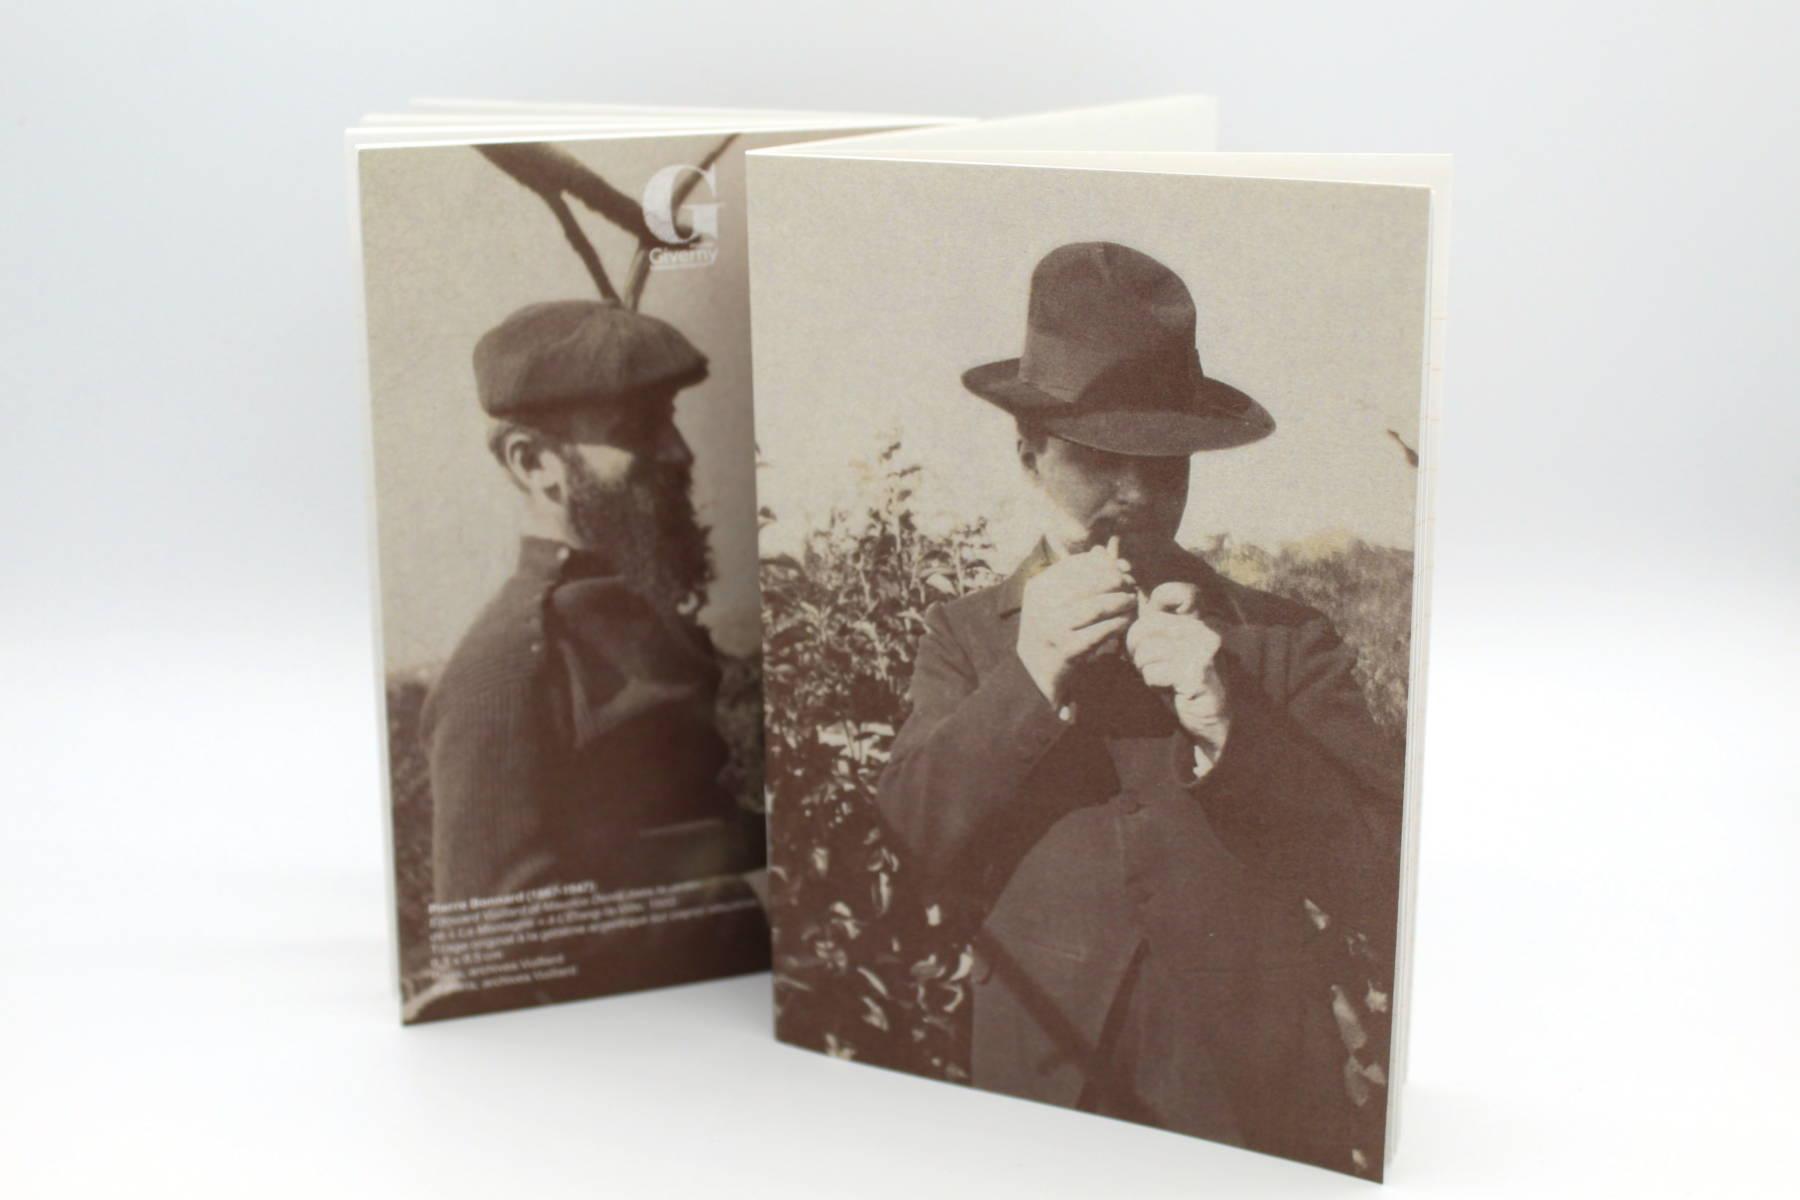 Cahier A6 - Photo de Vuillard et Denis par Bonnard